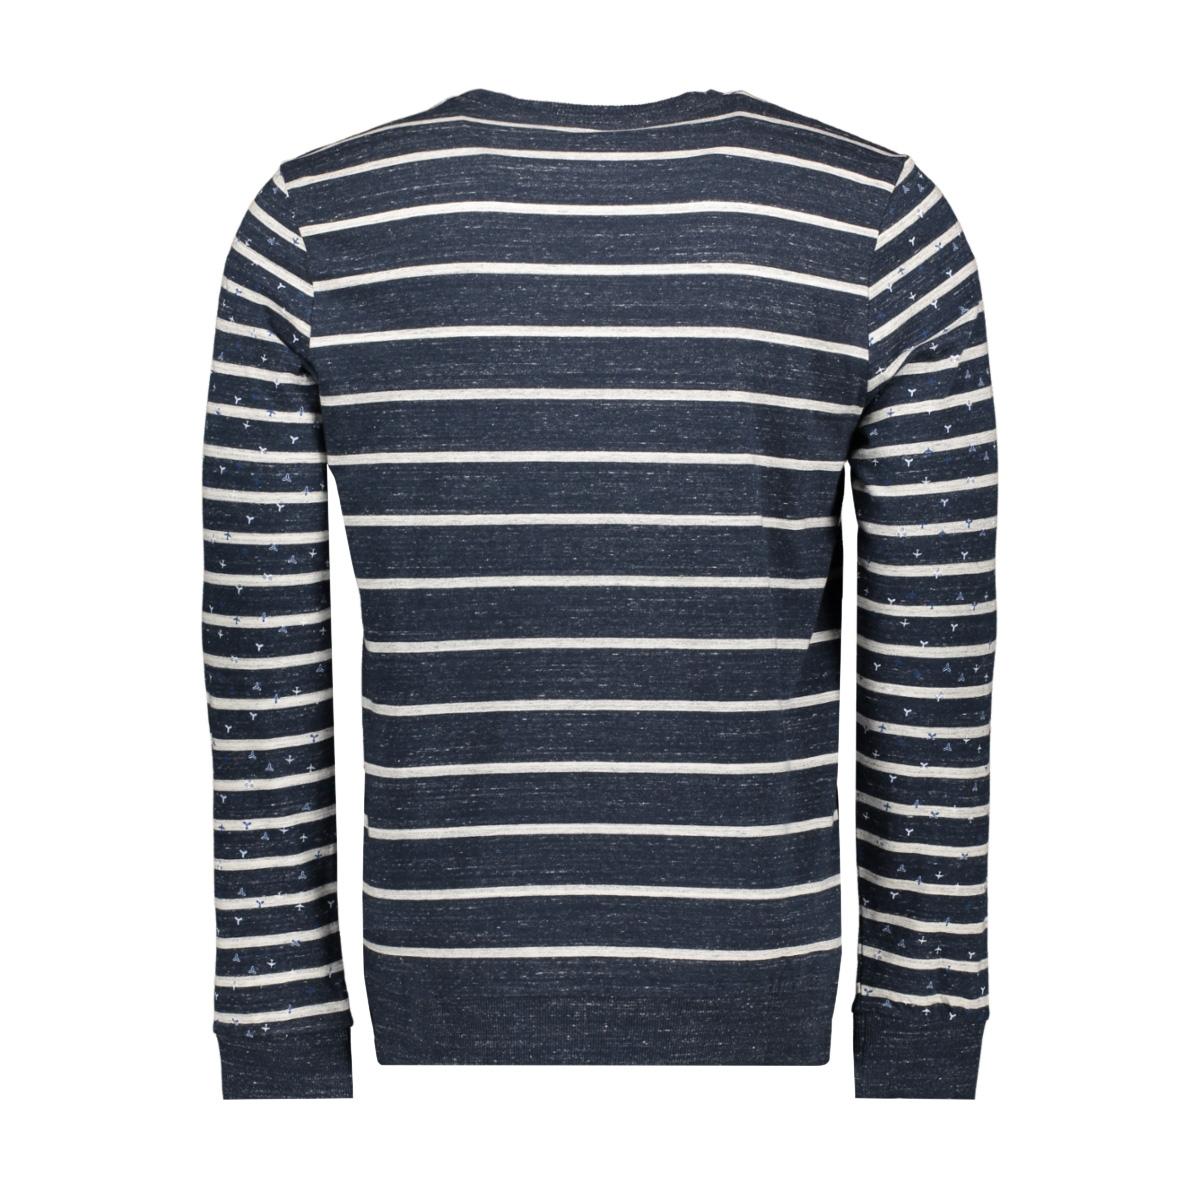 pts191551 pme legend t-shirt 5110